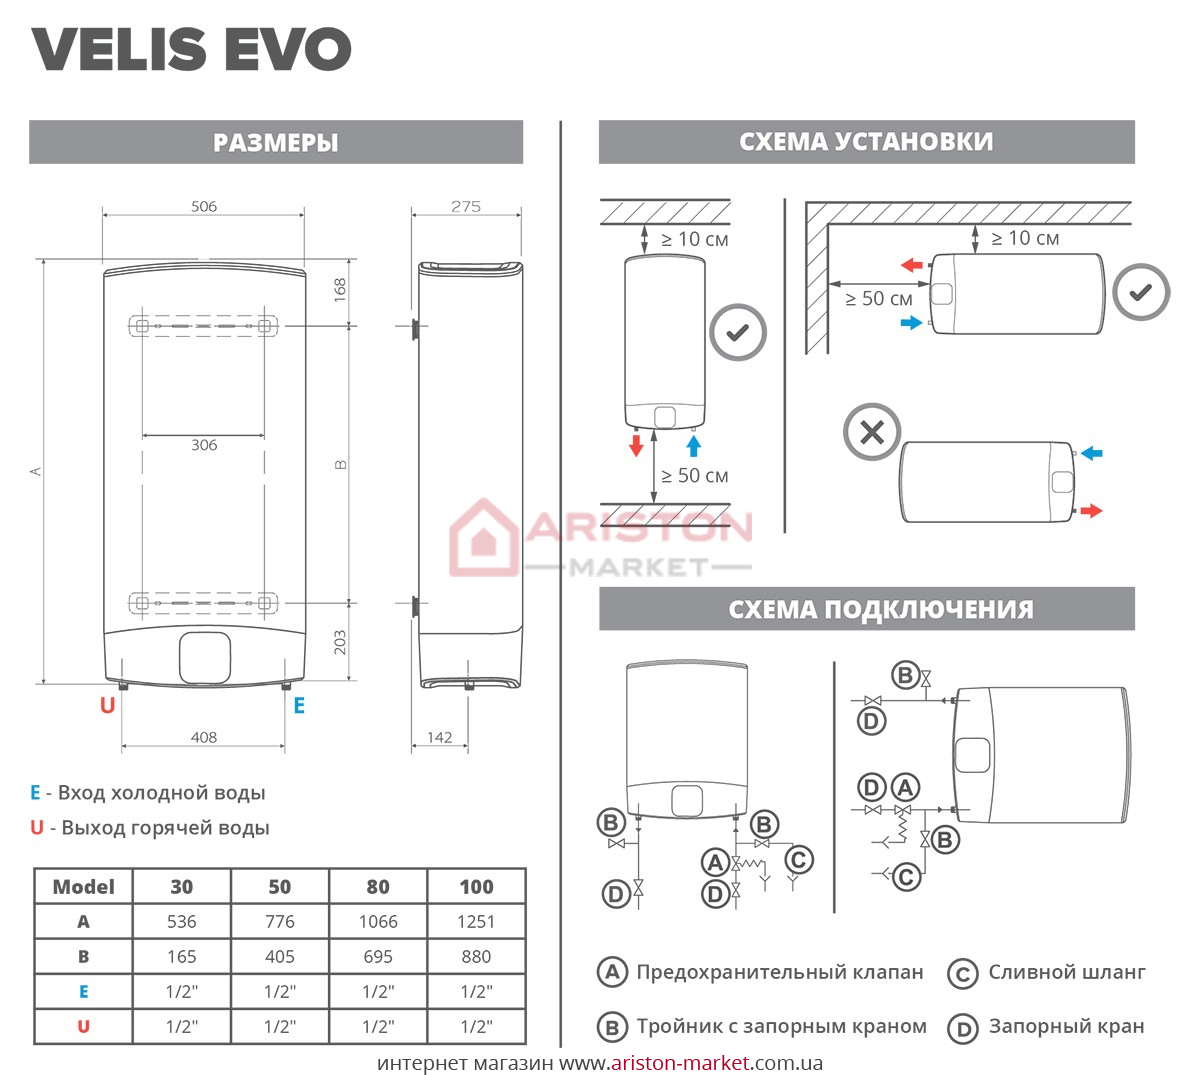 Ariston ABS Velis Evo Power 80 схема, габариты, чертеж